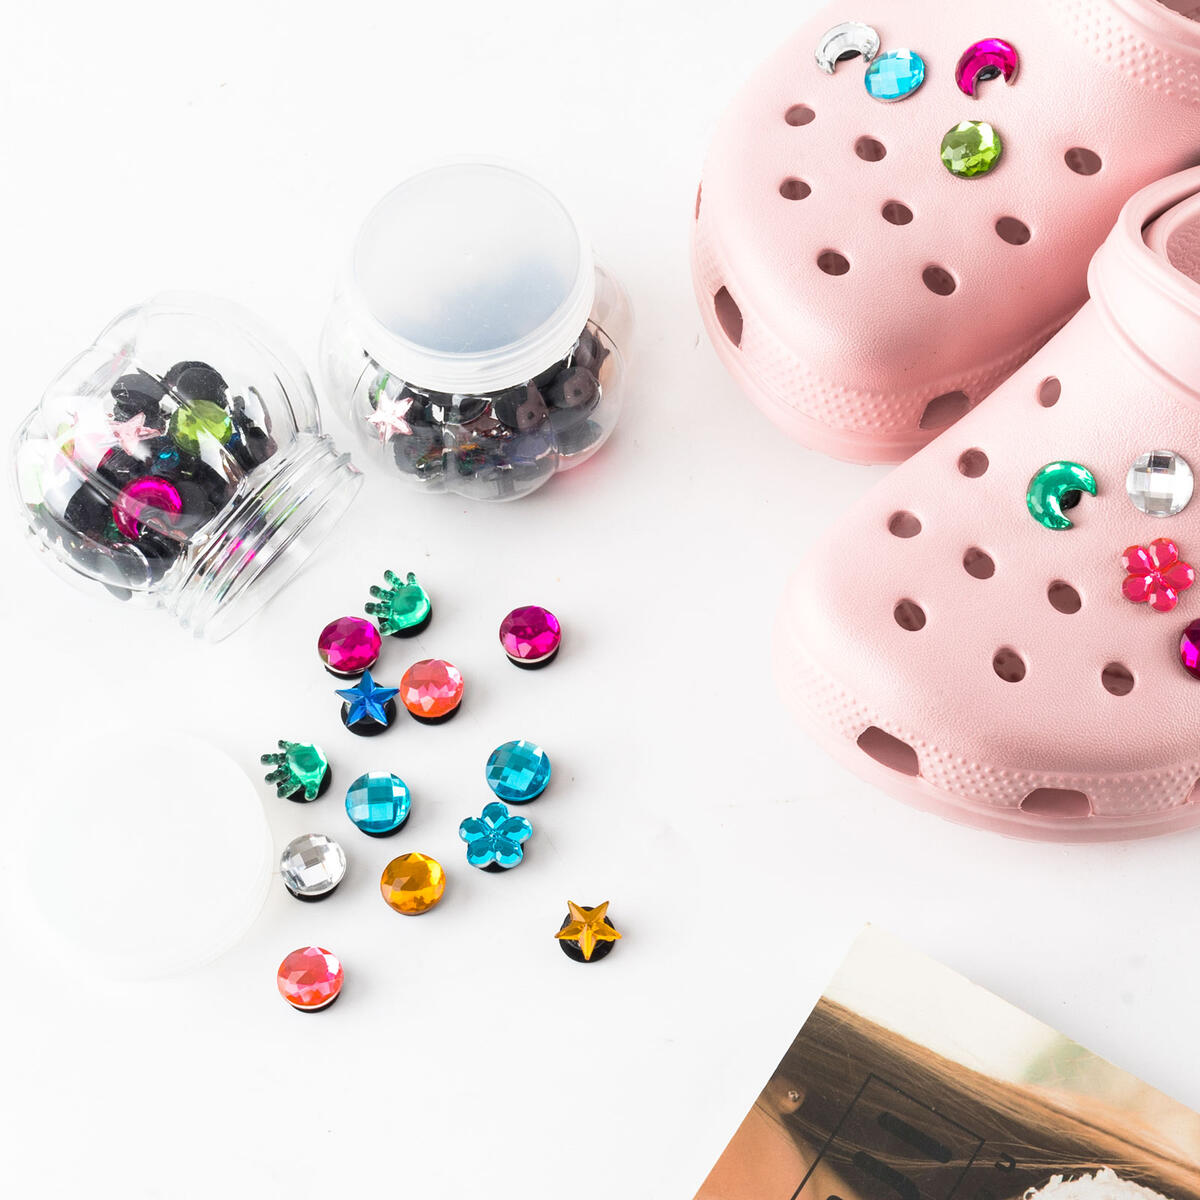 Shoe Charms for Crocs Clog Colorful Rhinestone Jibbitz